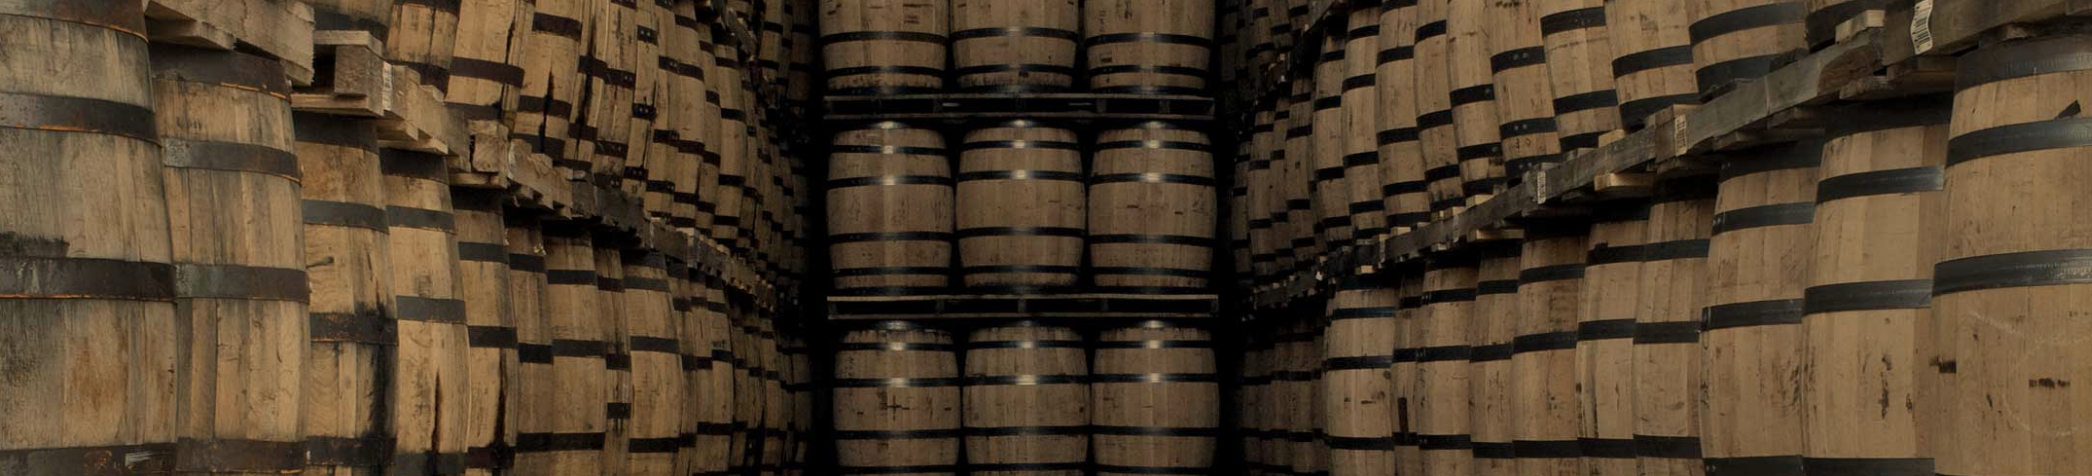 Barrels of Crown Royal Whisky